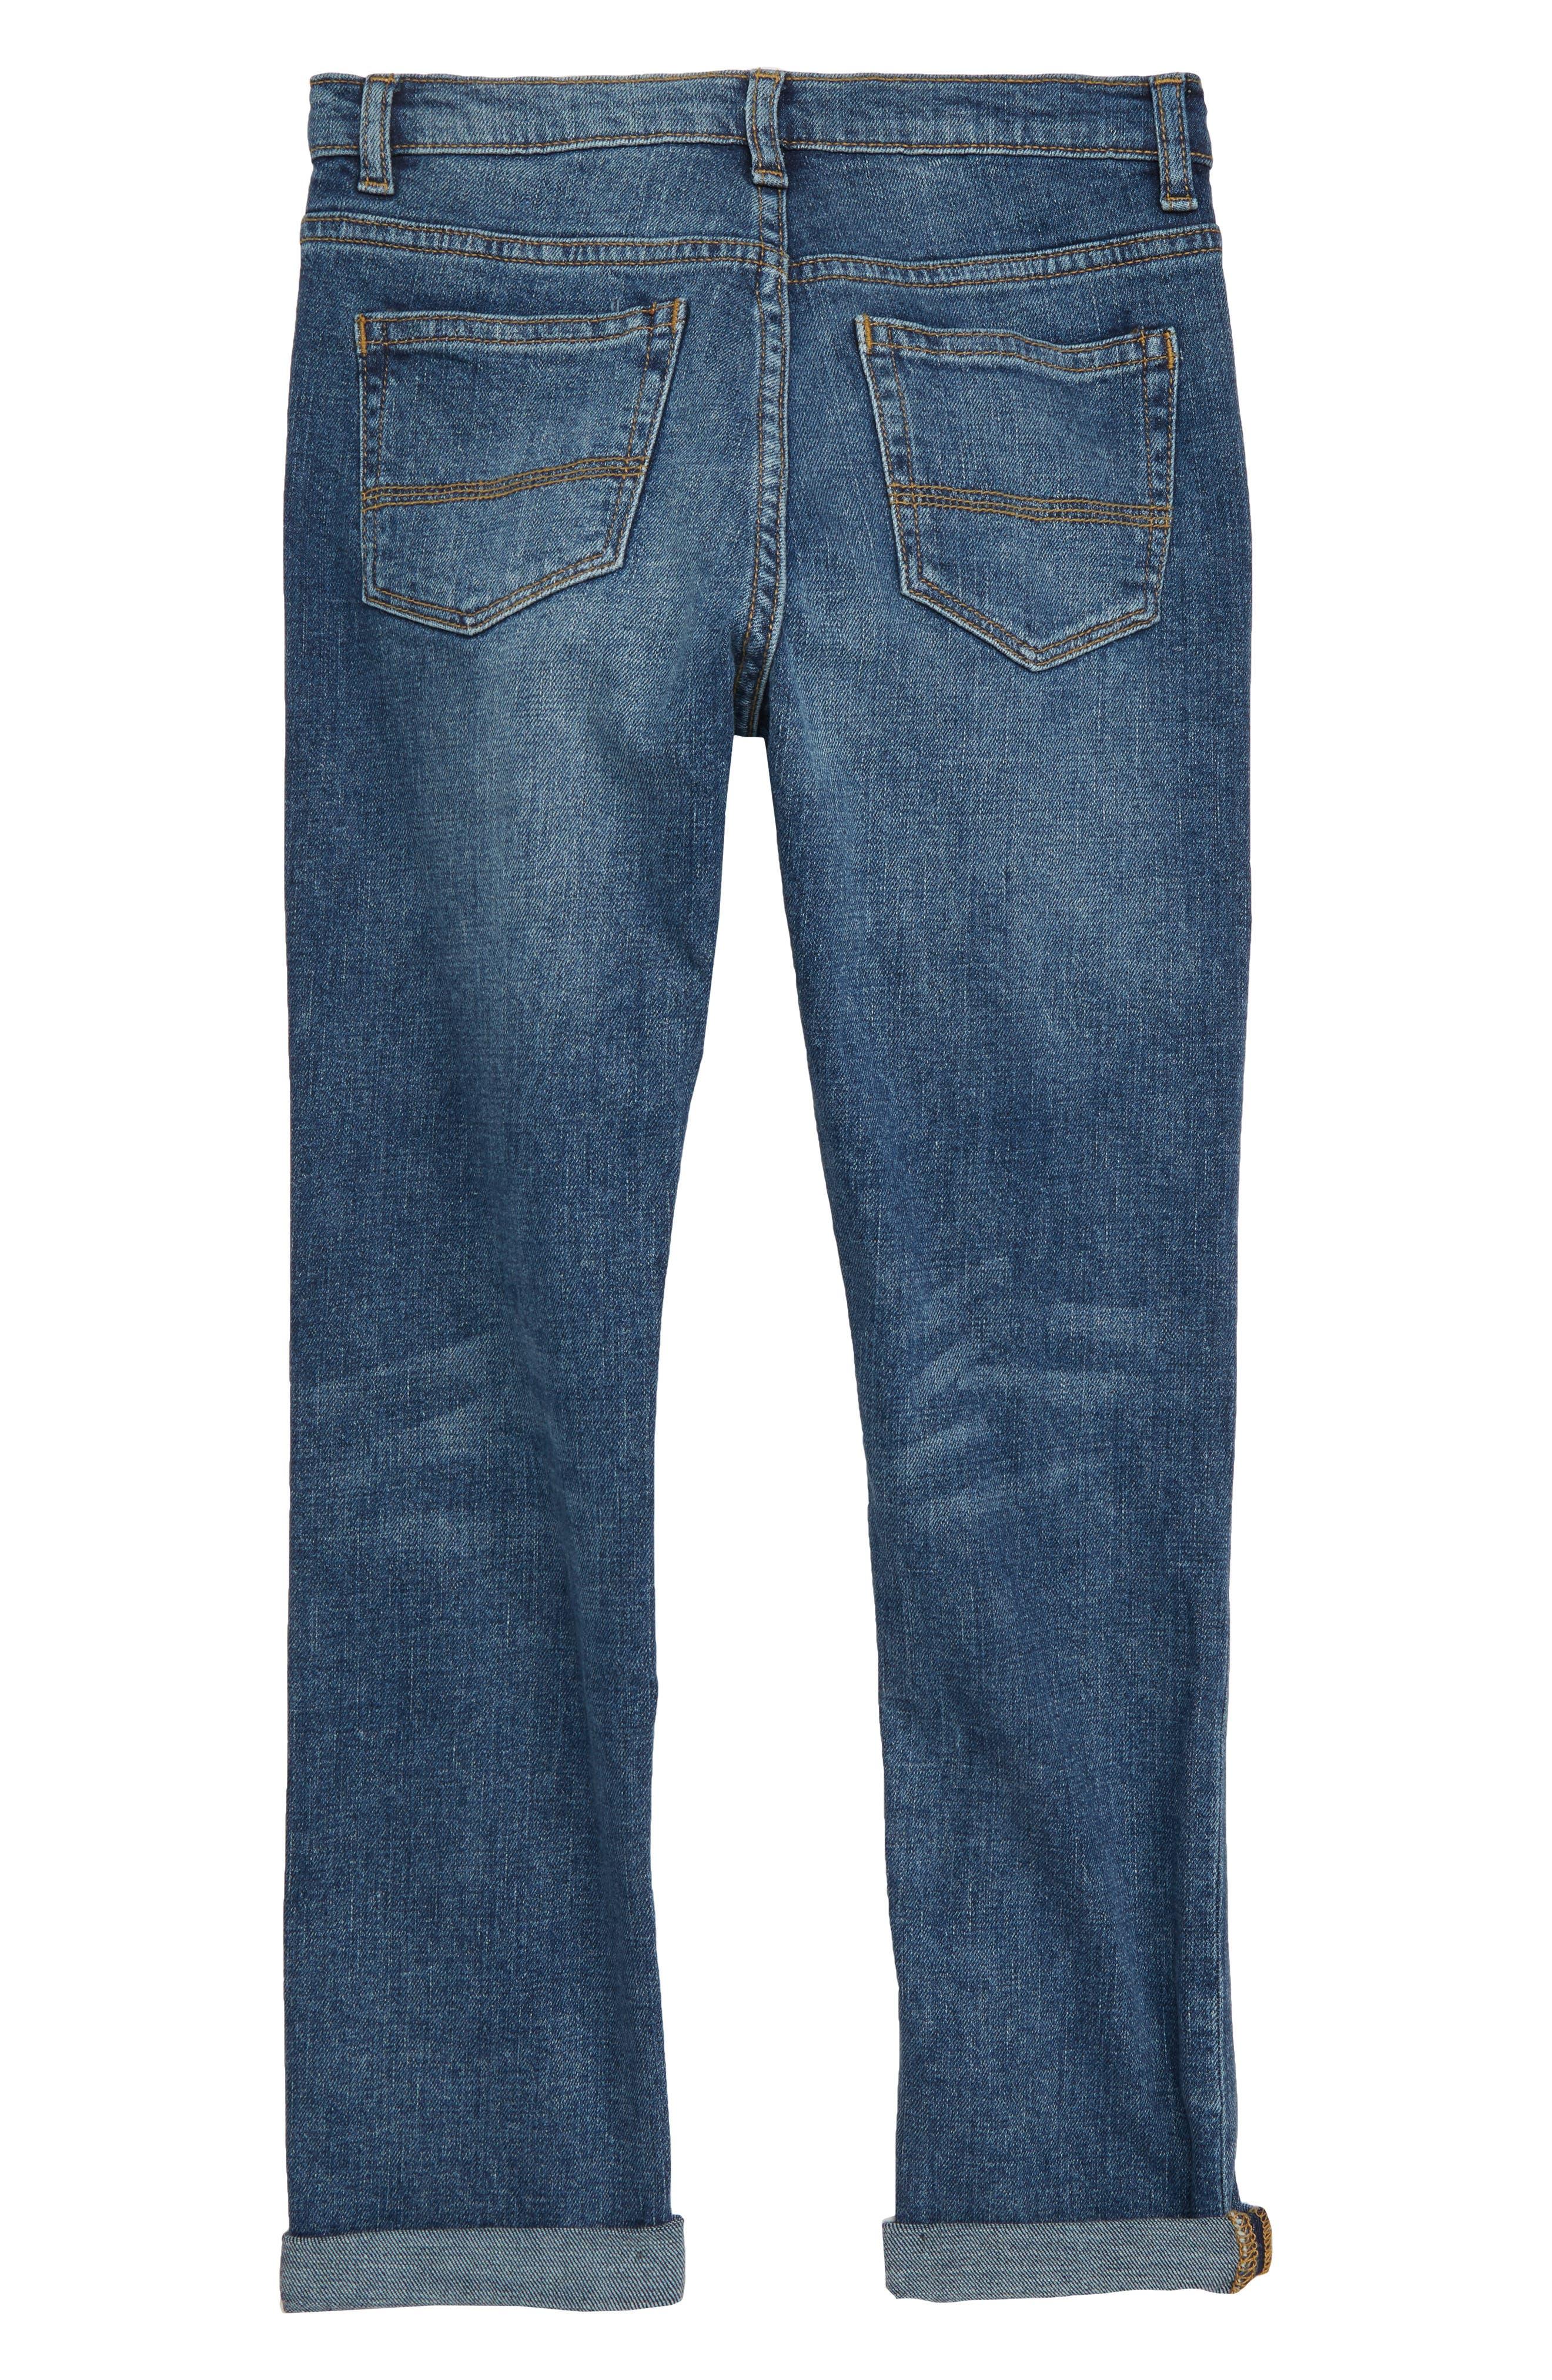 Slouch Jeans,                             Alternate thumbnail 2, color,                             400